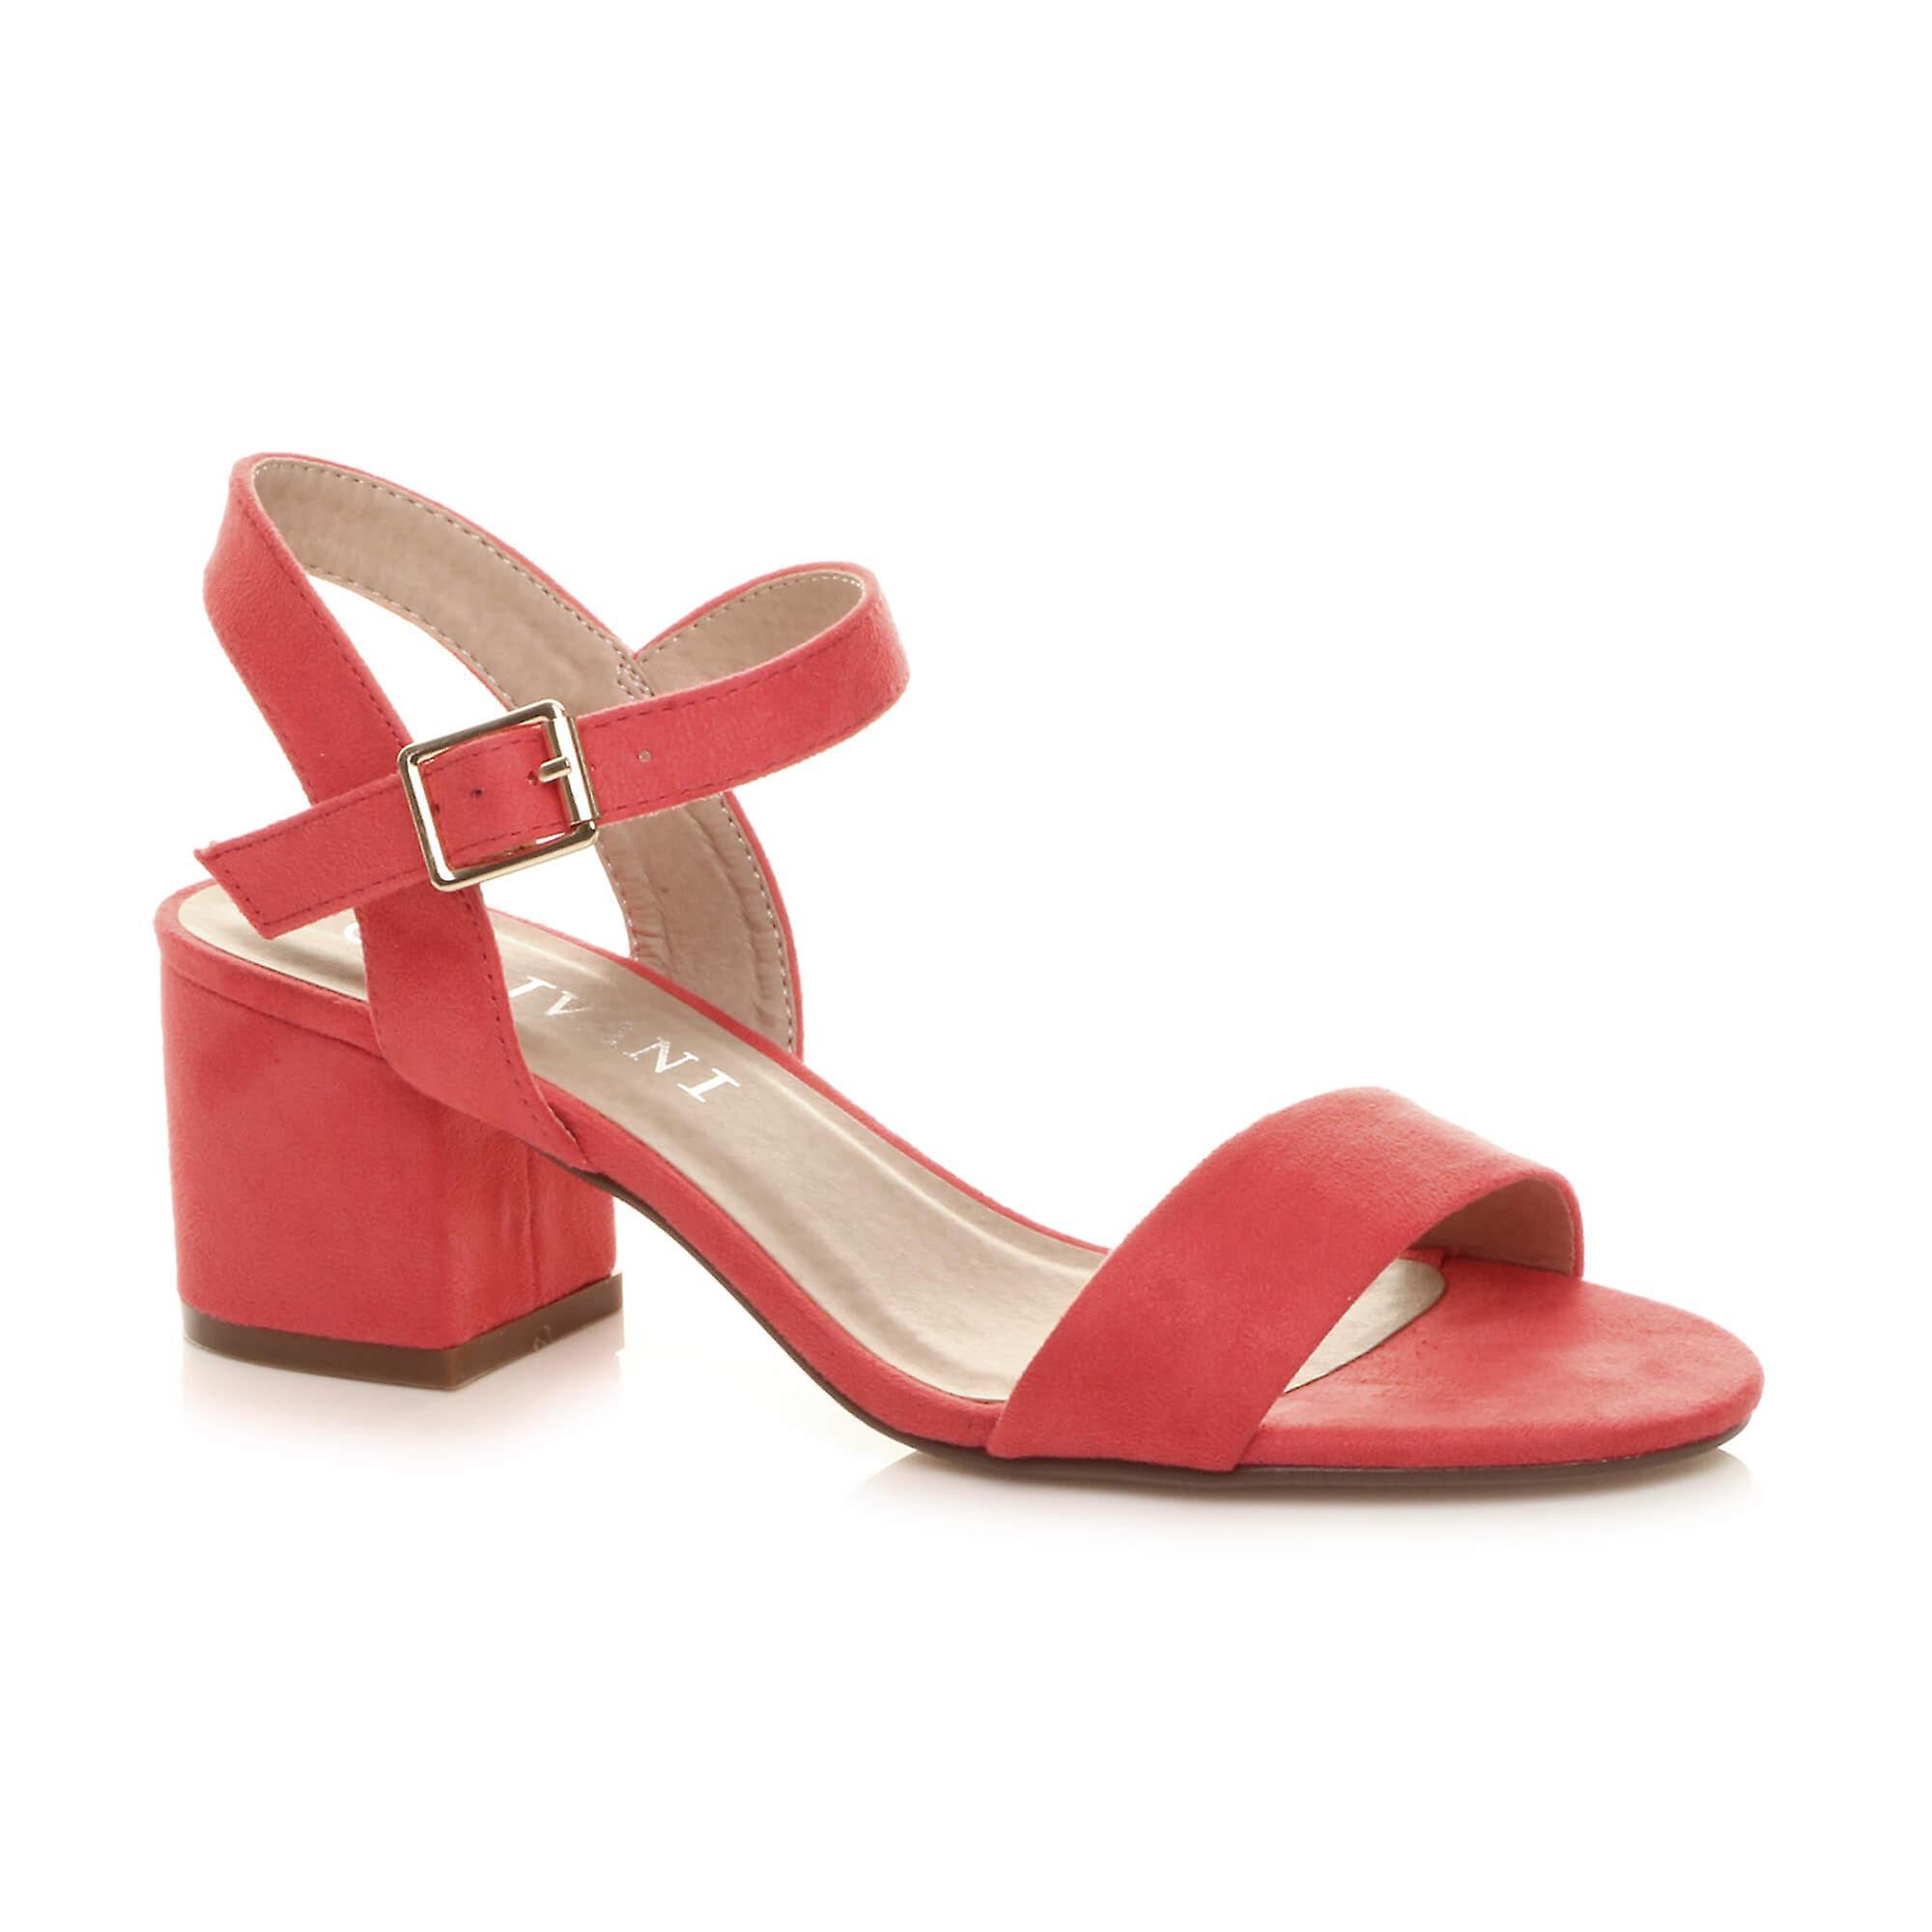 Ajvani womens mid low block heel peep toe ankle strap strappy party sandals erGma